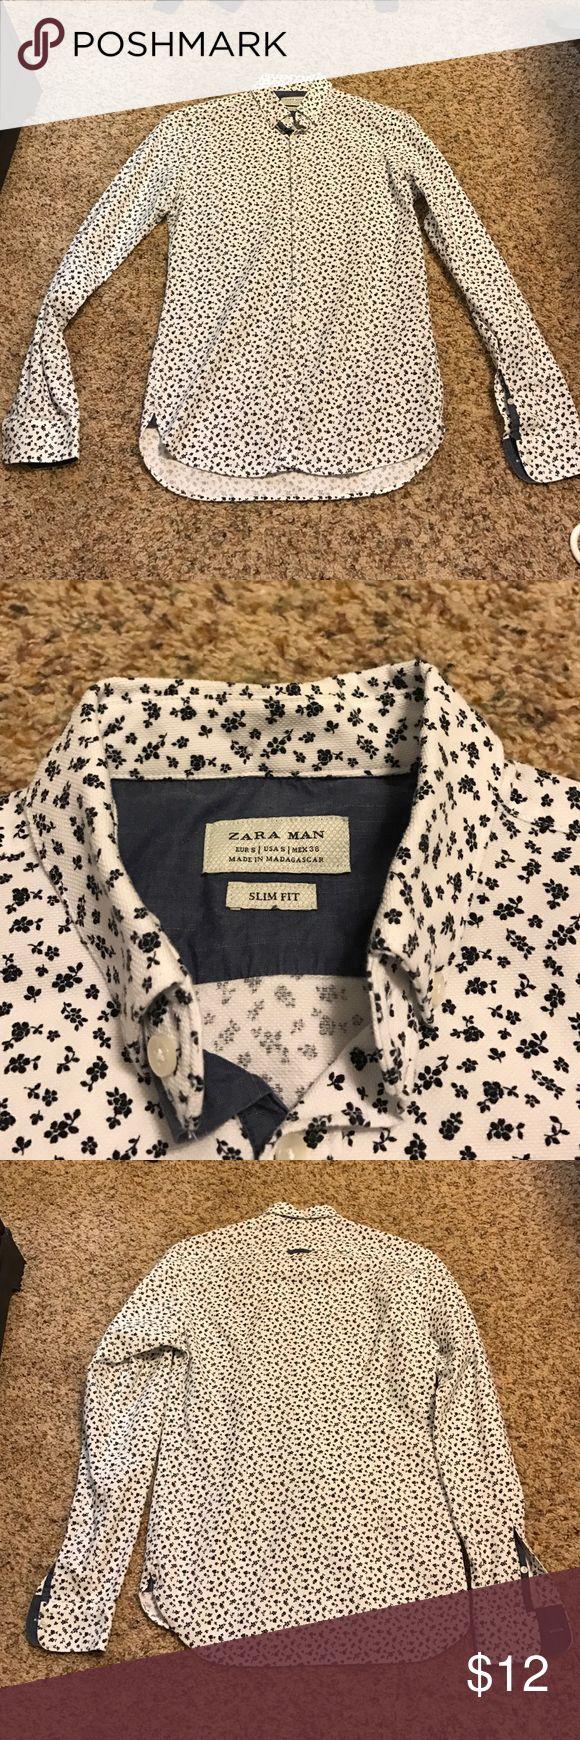 ZARA MAN Slim Fit shirt ZARA MAN Slim Fit shirt, seldom wear Zara Shirts Dress Shirts